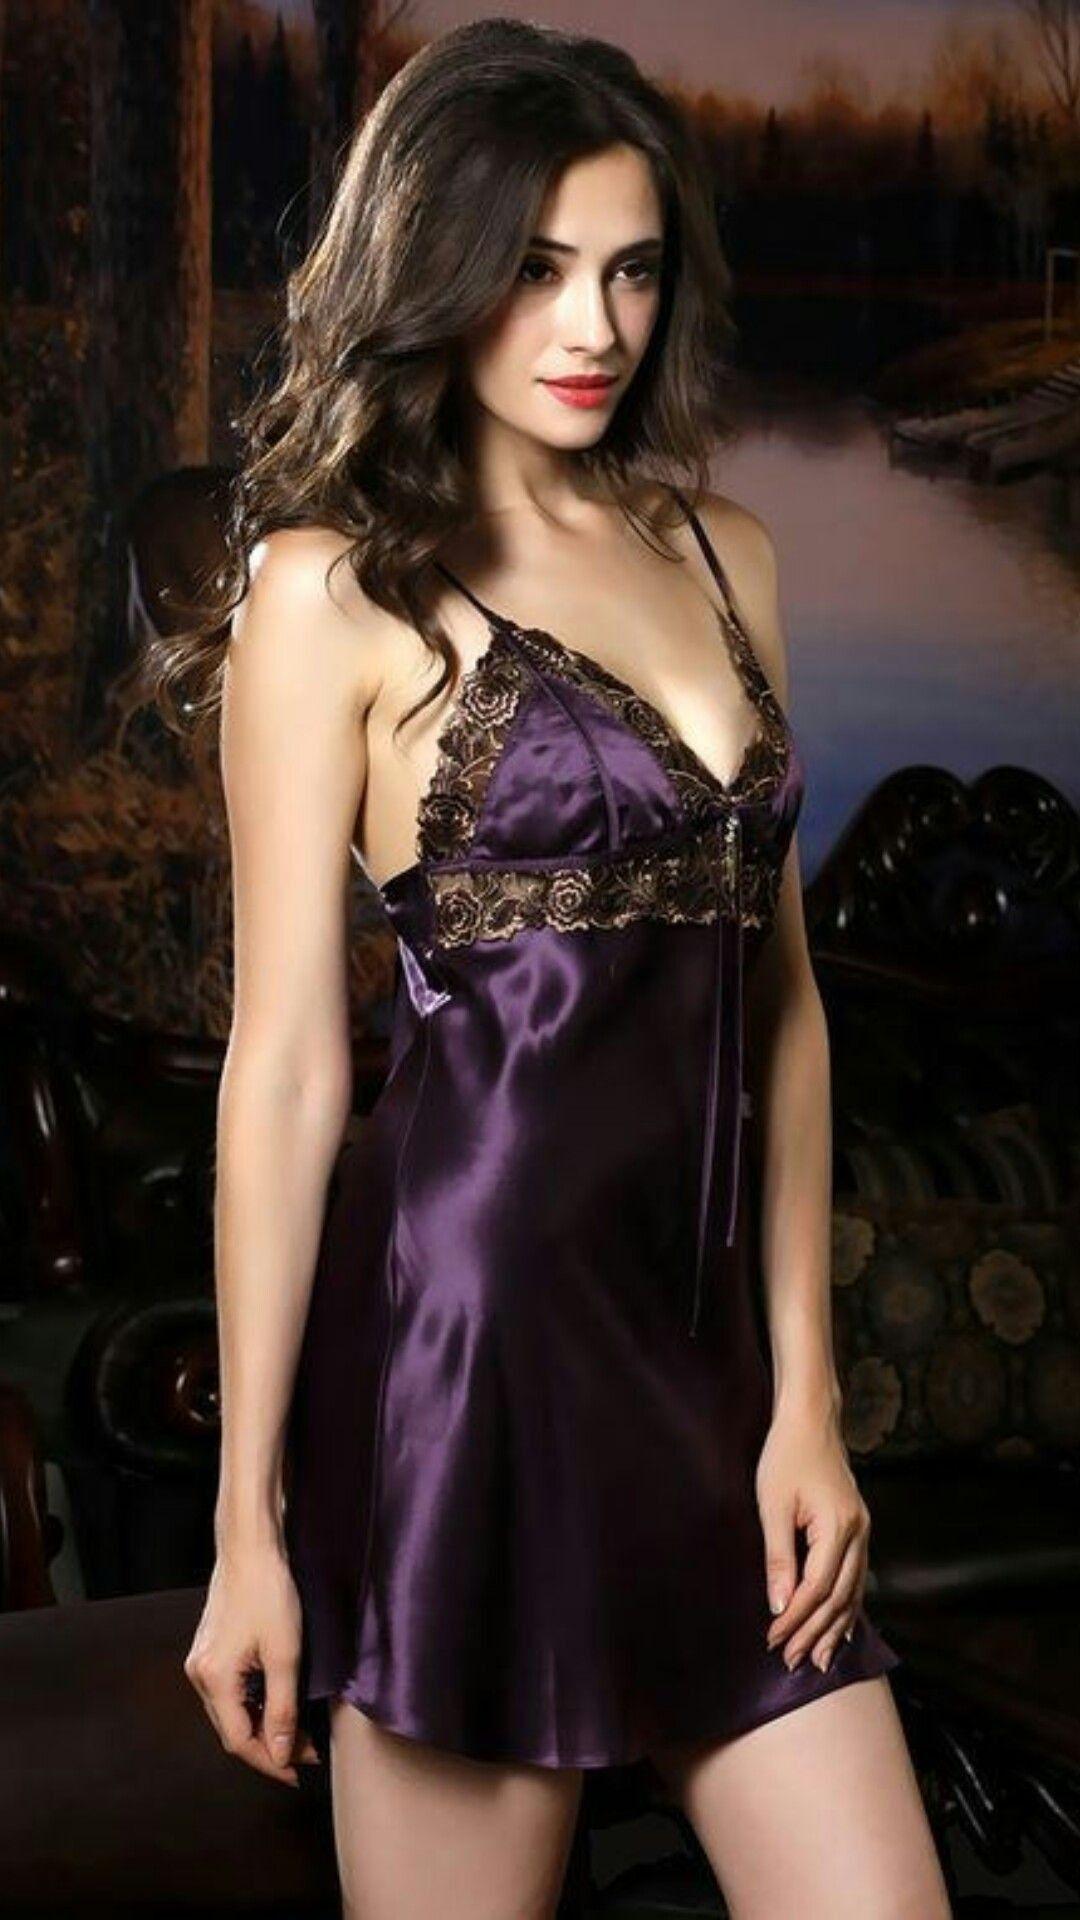 Andrea Crossdresser Absolutely Stunning In 2018 Pinterest Magic Eve Bra With Design Expert Victorian Style Hitam Purple Lingerie Sexy Dress Slips Satin